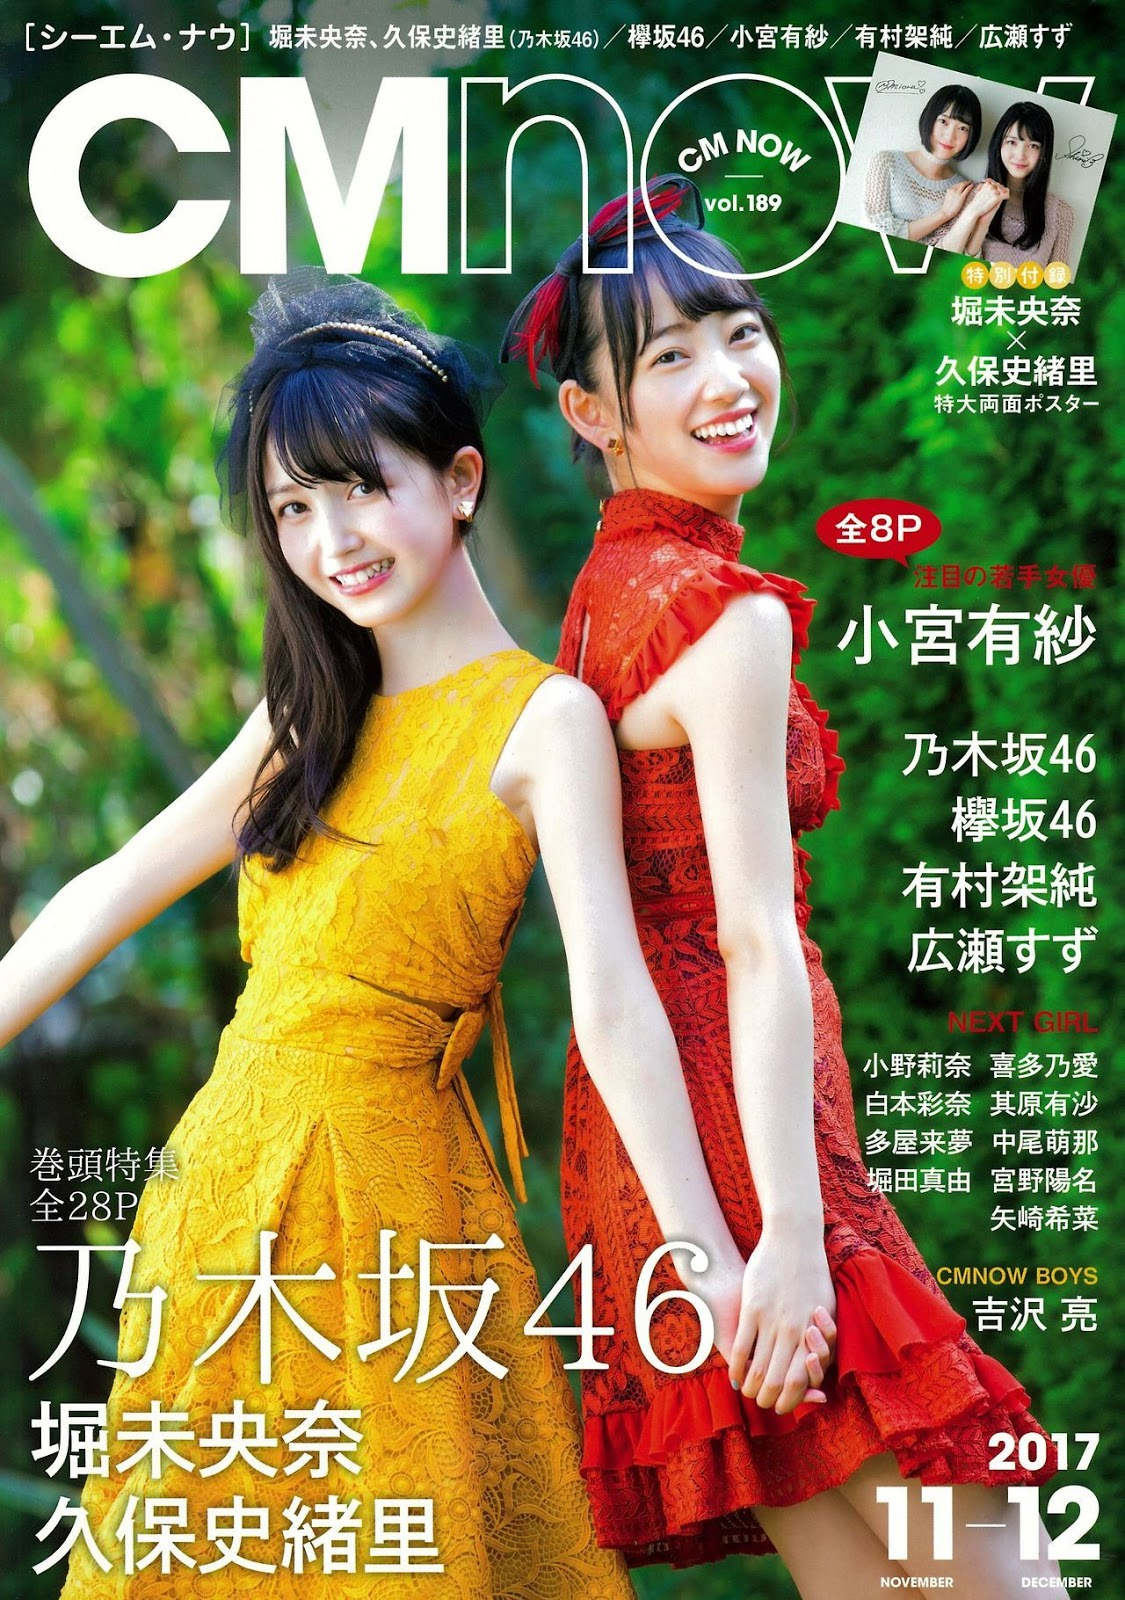 Kubo Shiori 久保史緒里, Hori Miona 堀未央奈, CM NOW 2017 Vol.189